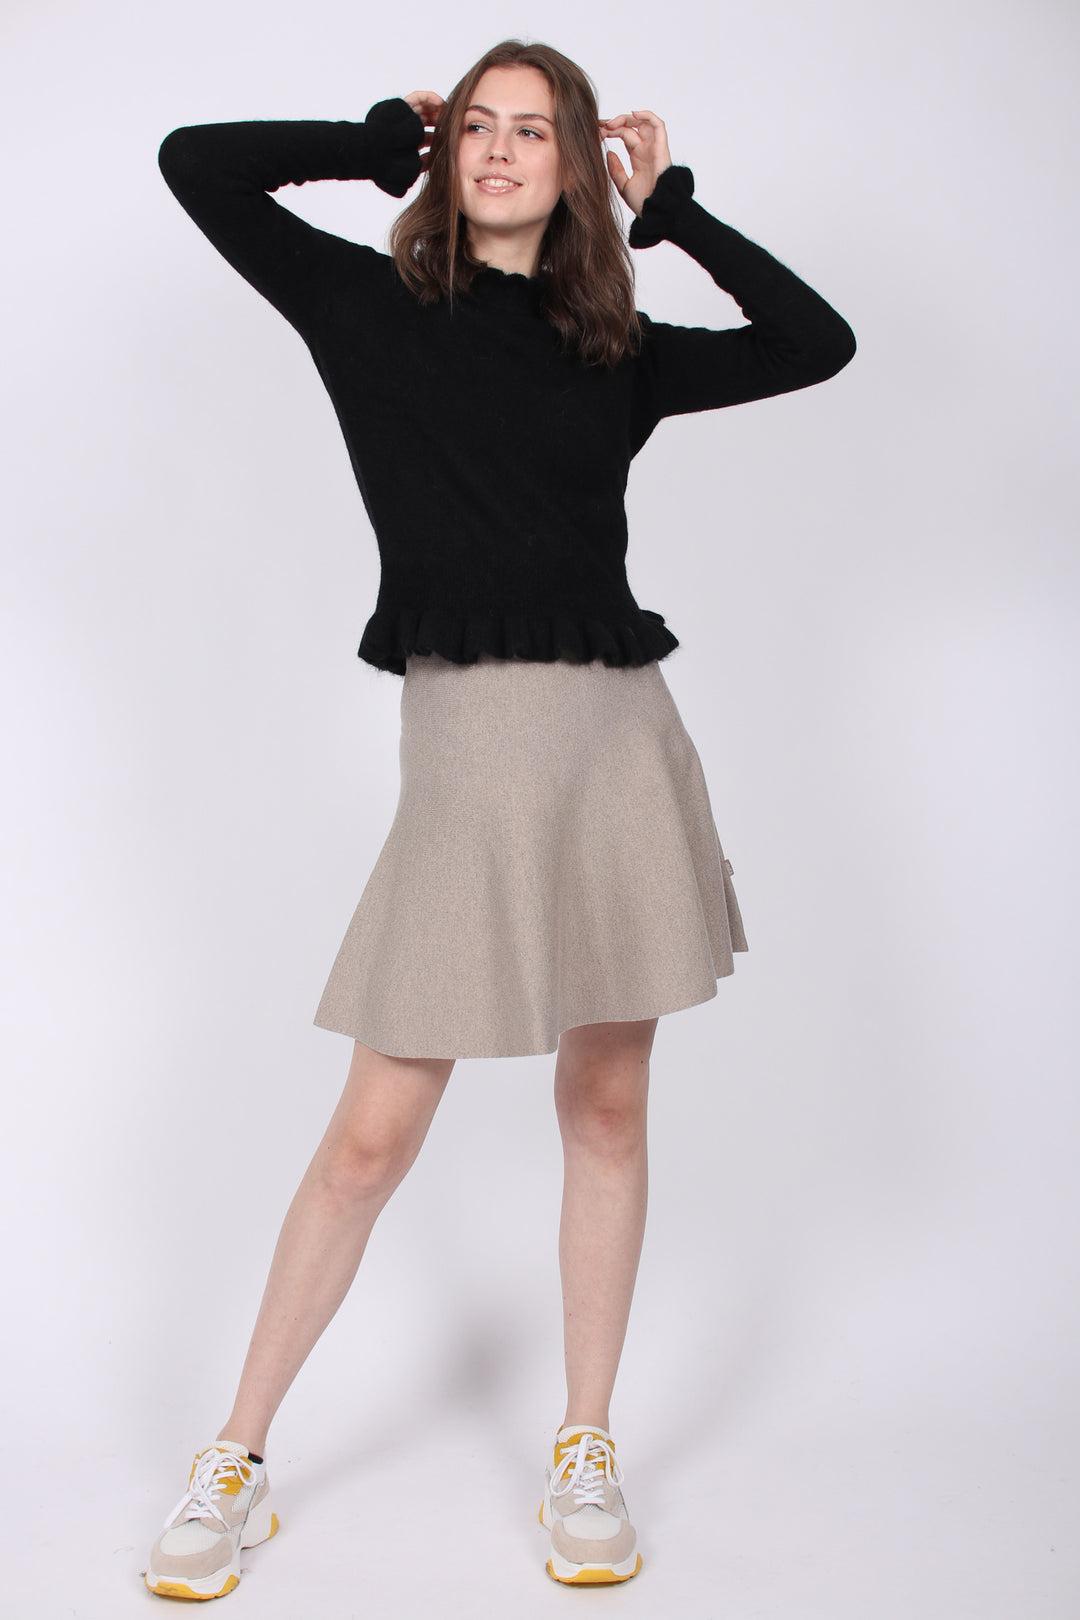 Ella & il | Triny Merino Skirt Beige | VILLOID.no